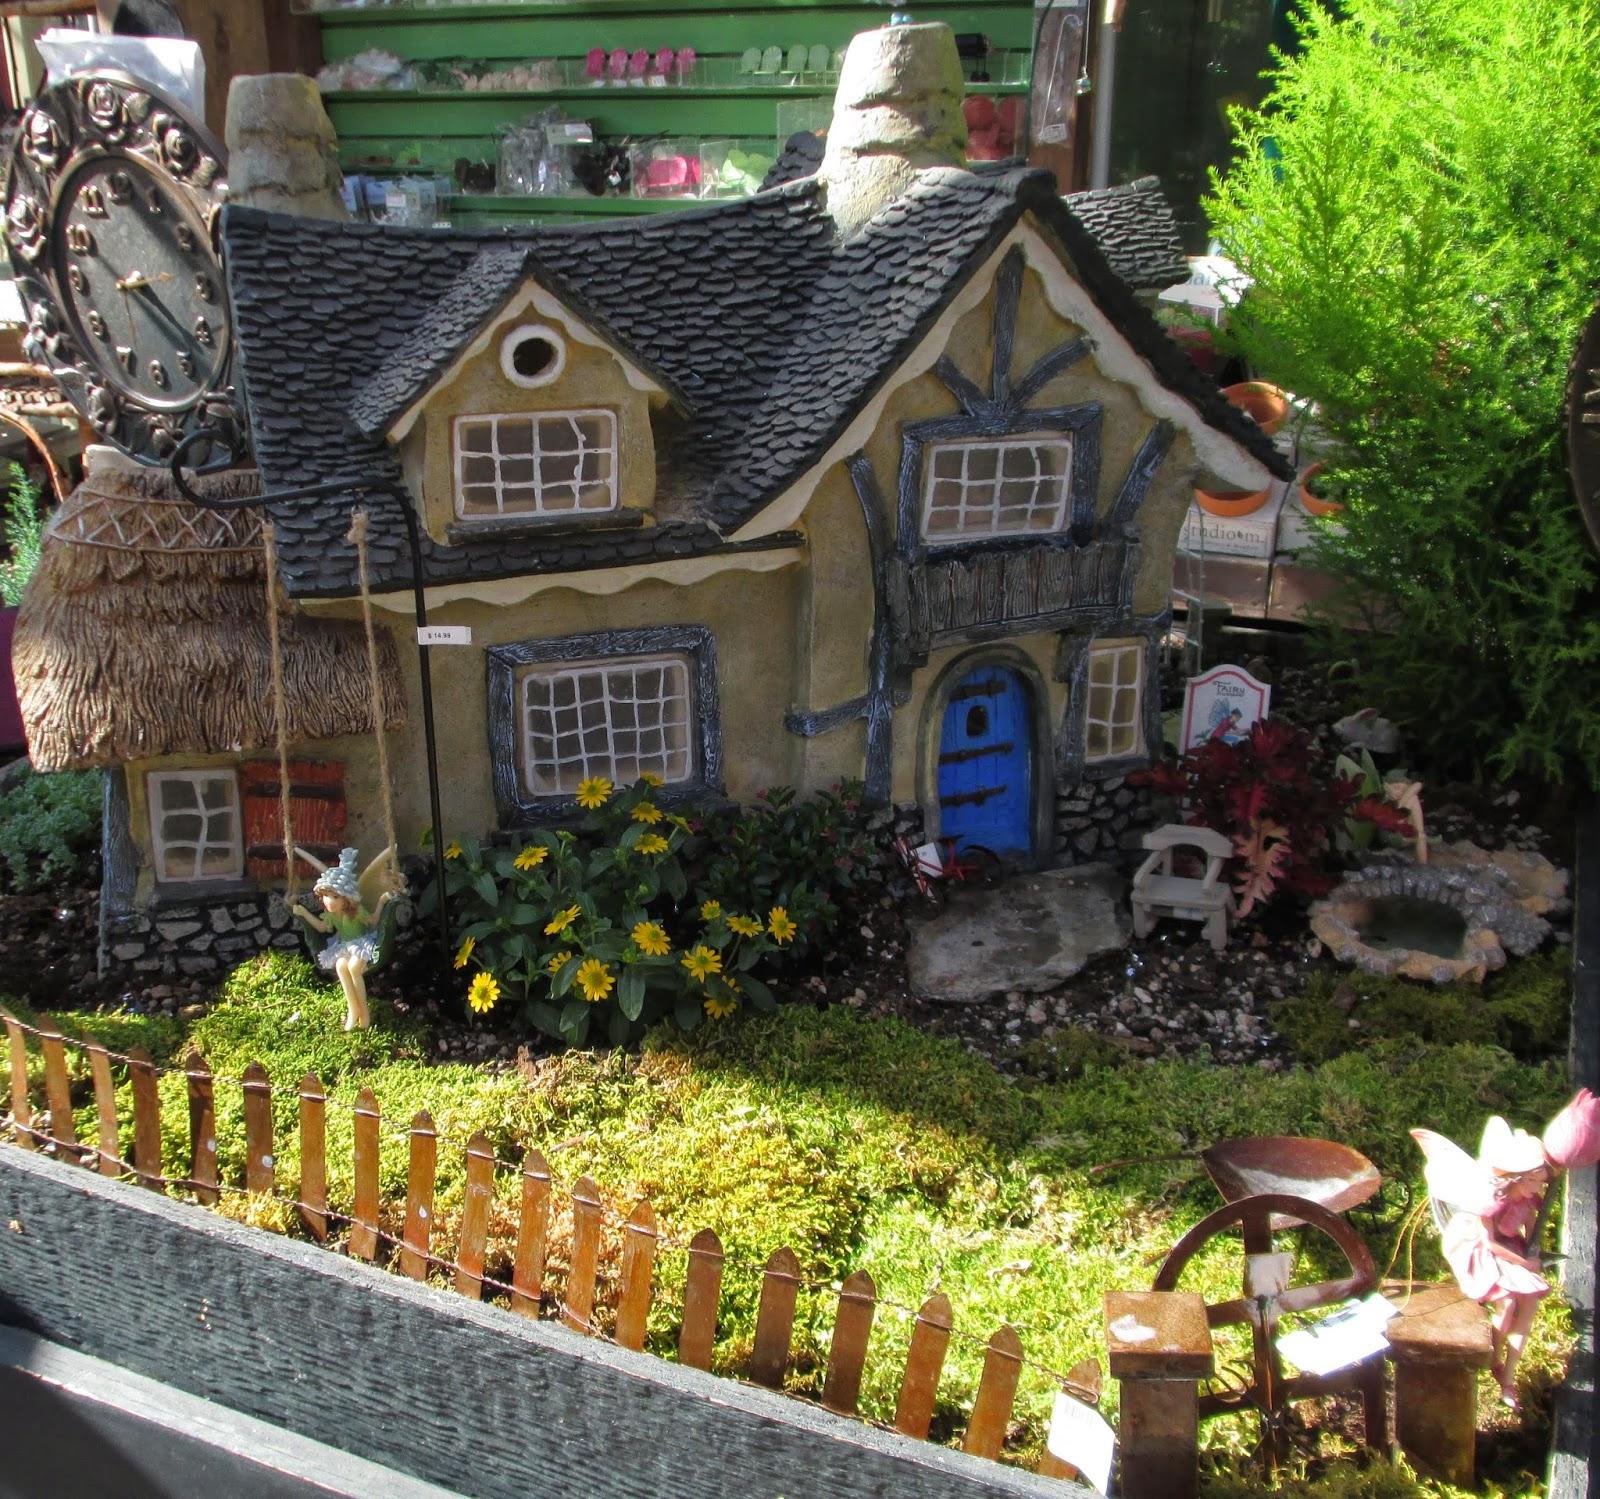 Edible Landscaping And Fairy Gardens: Susan's In The Garden